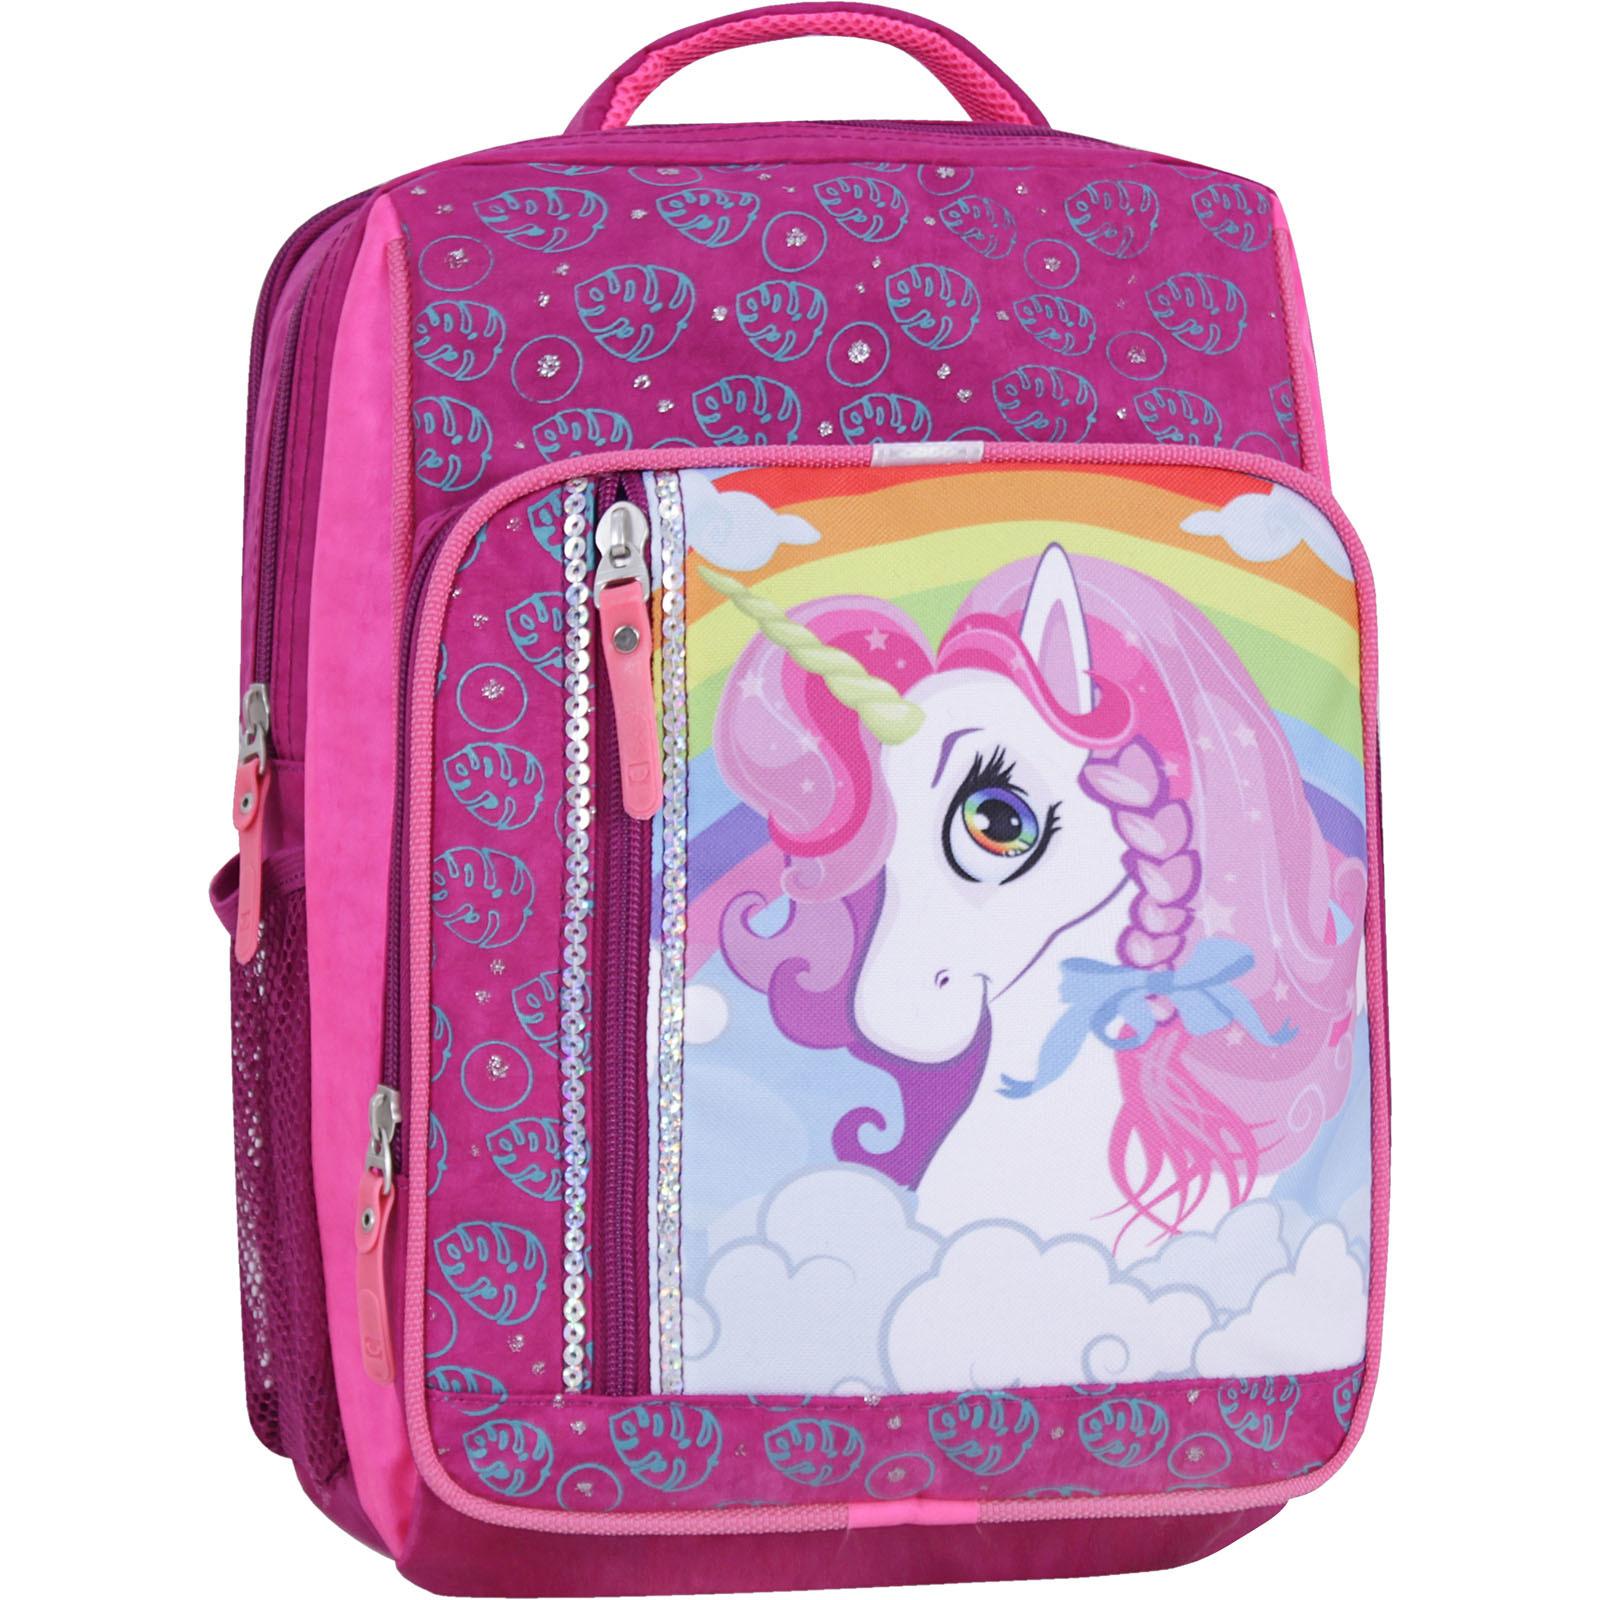 Школьные рюкзаки Рюкзак школьный Bagland Школьник 8 л. 143 малиновый 676 (0012870) IMG_2759_суб.767_-1600.jpg